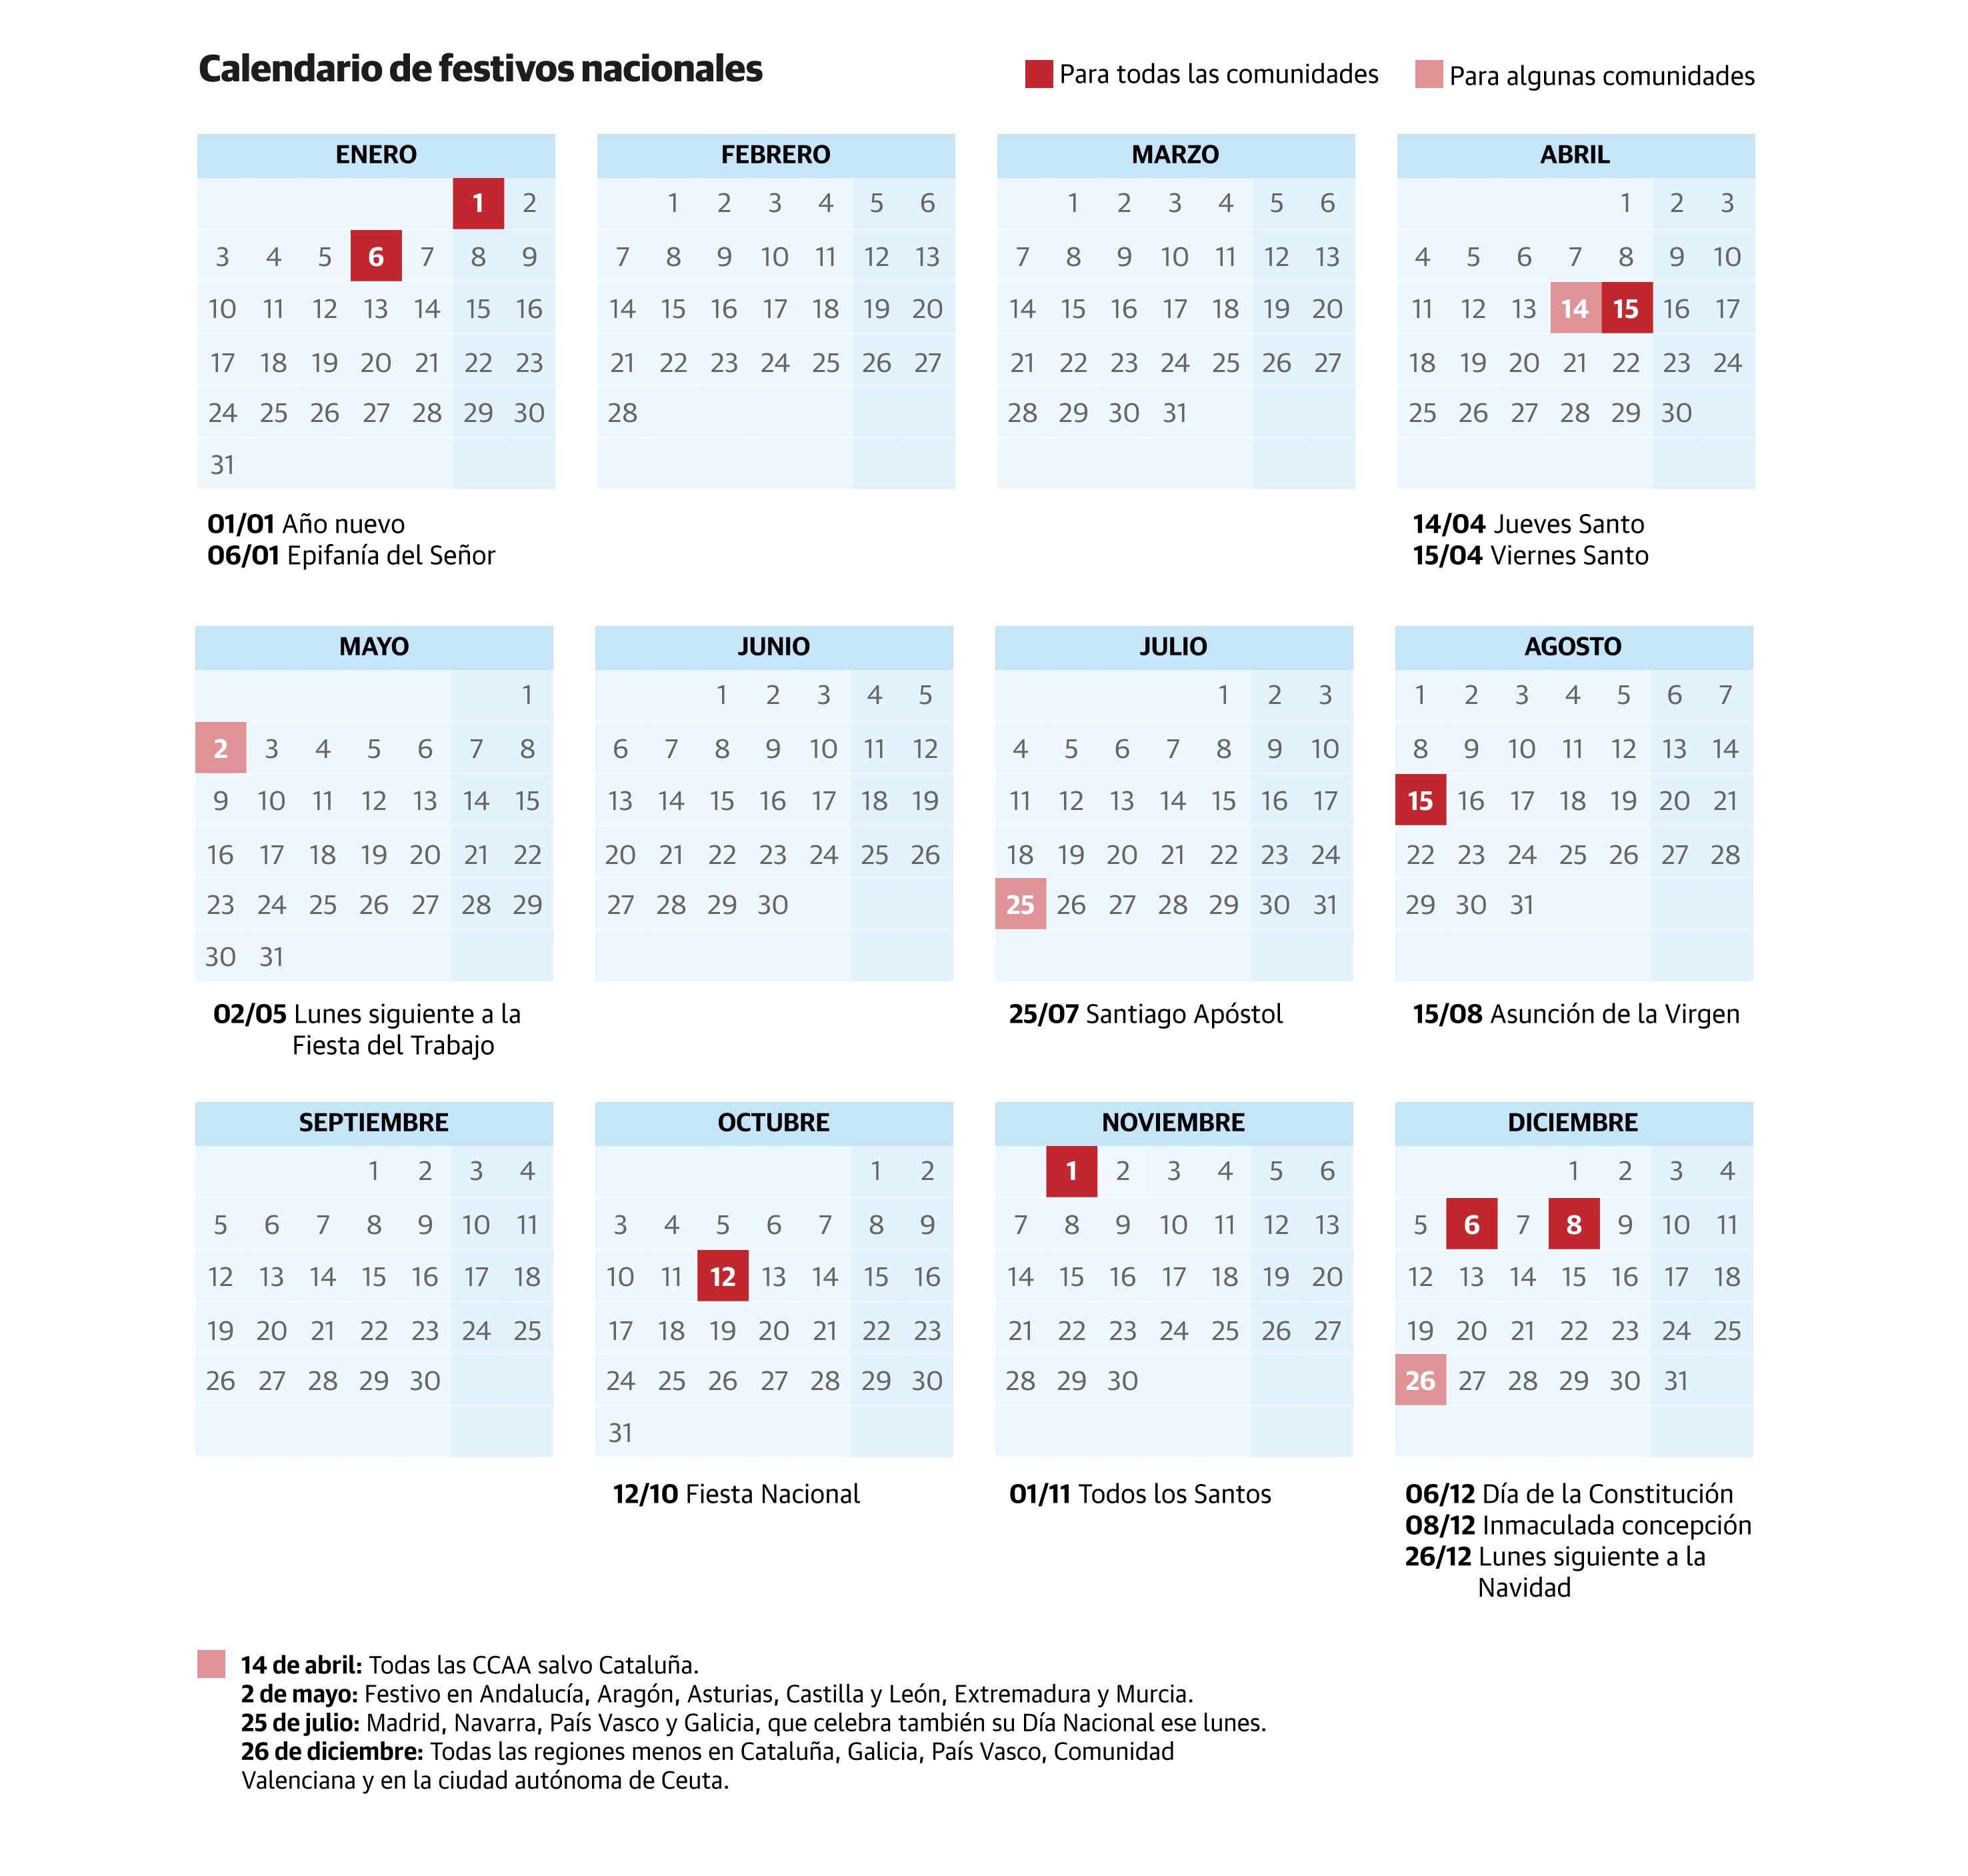 Calendario laboral de 2022: habrá ocho festivos comunes en toda España